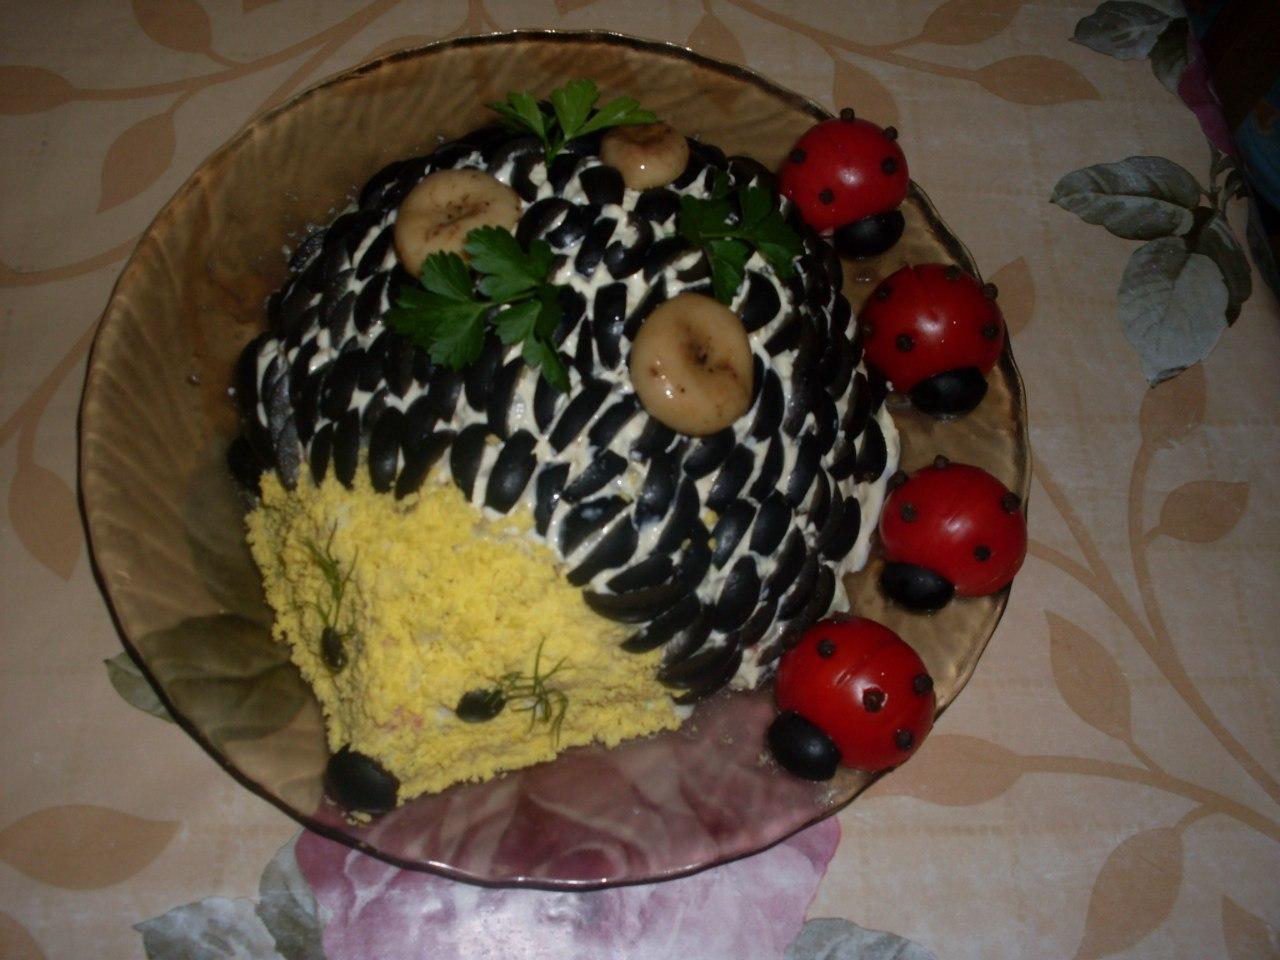 http://xoxi.ru/uploads/posts/2012-11/1352976090_eda_36_xoxi.ru.jpg